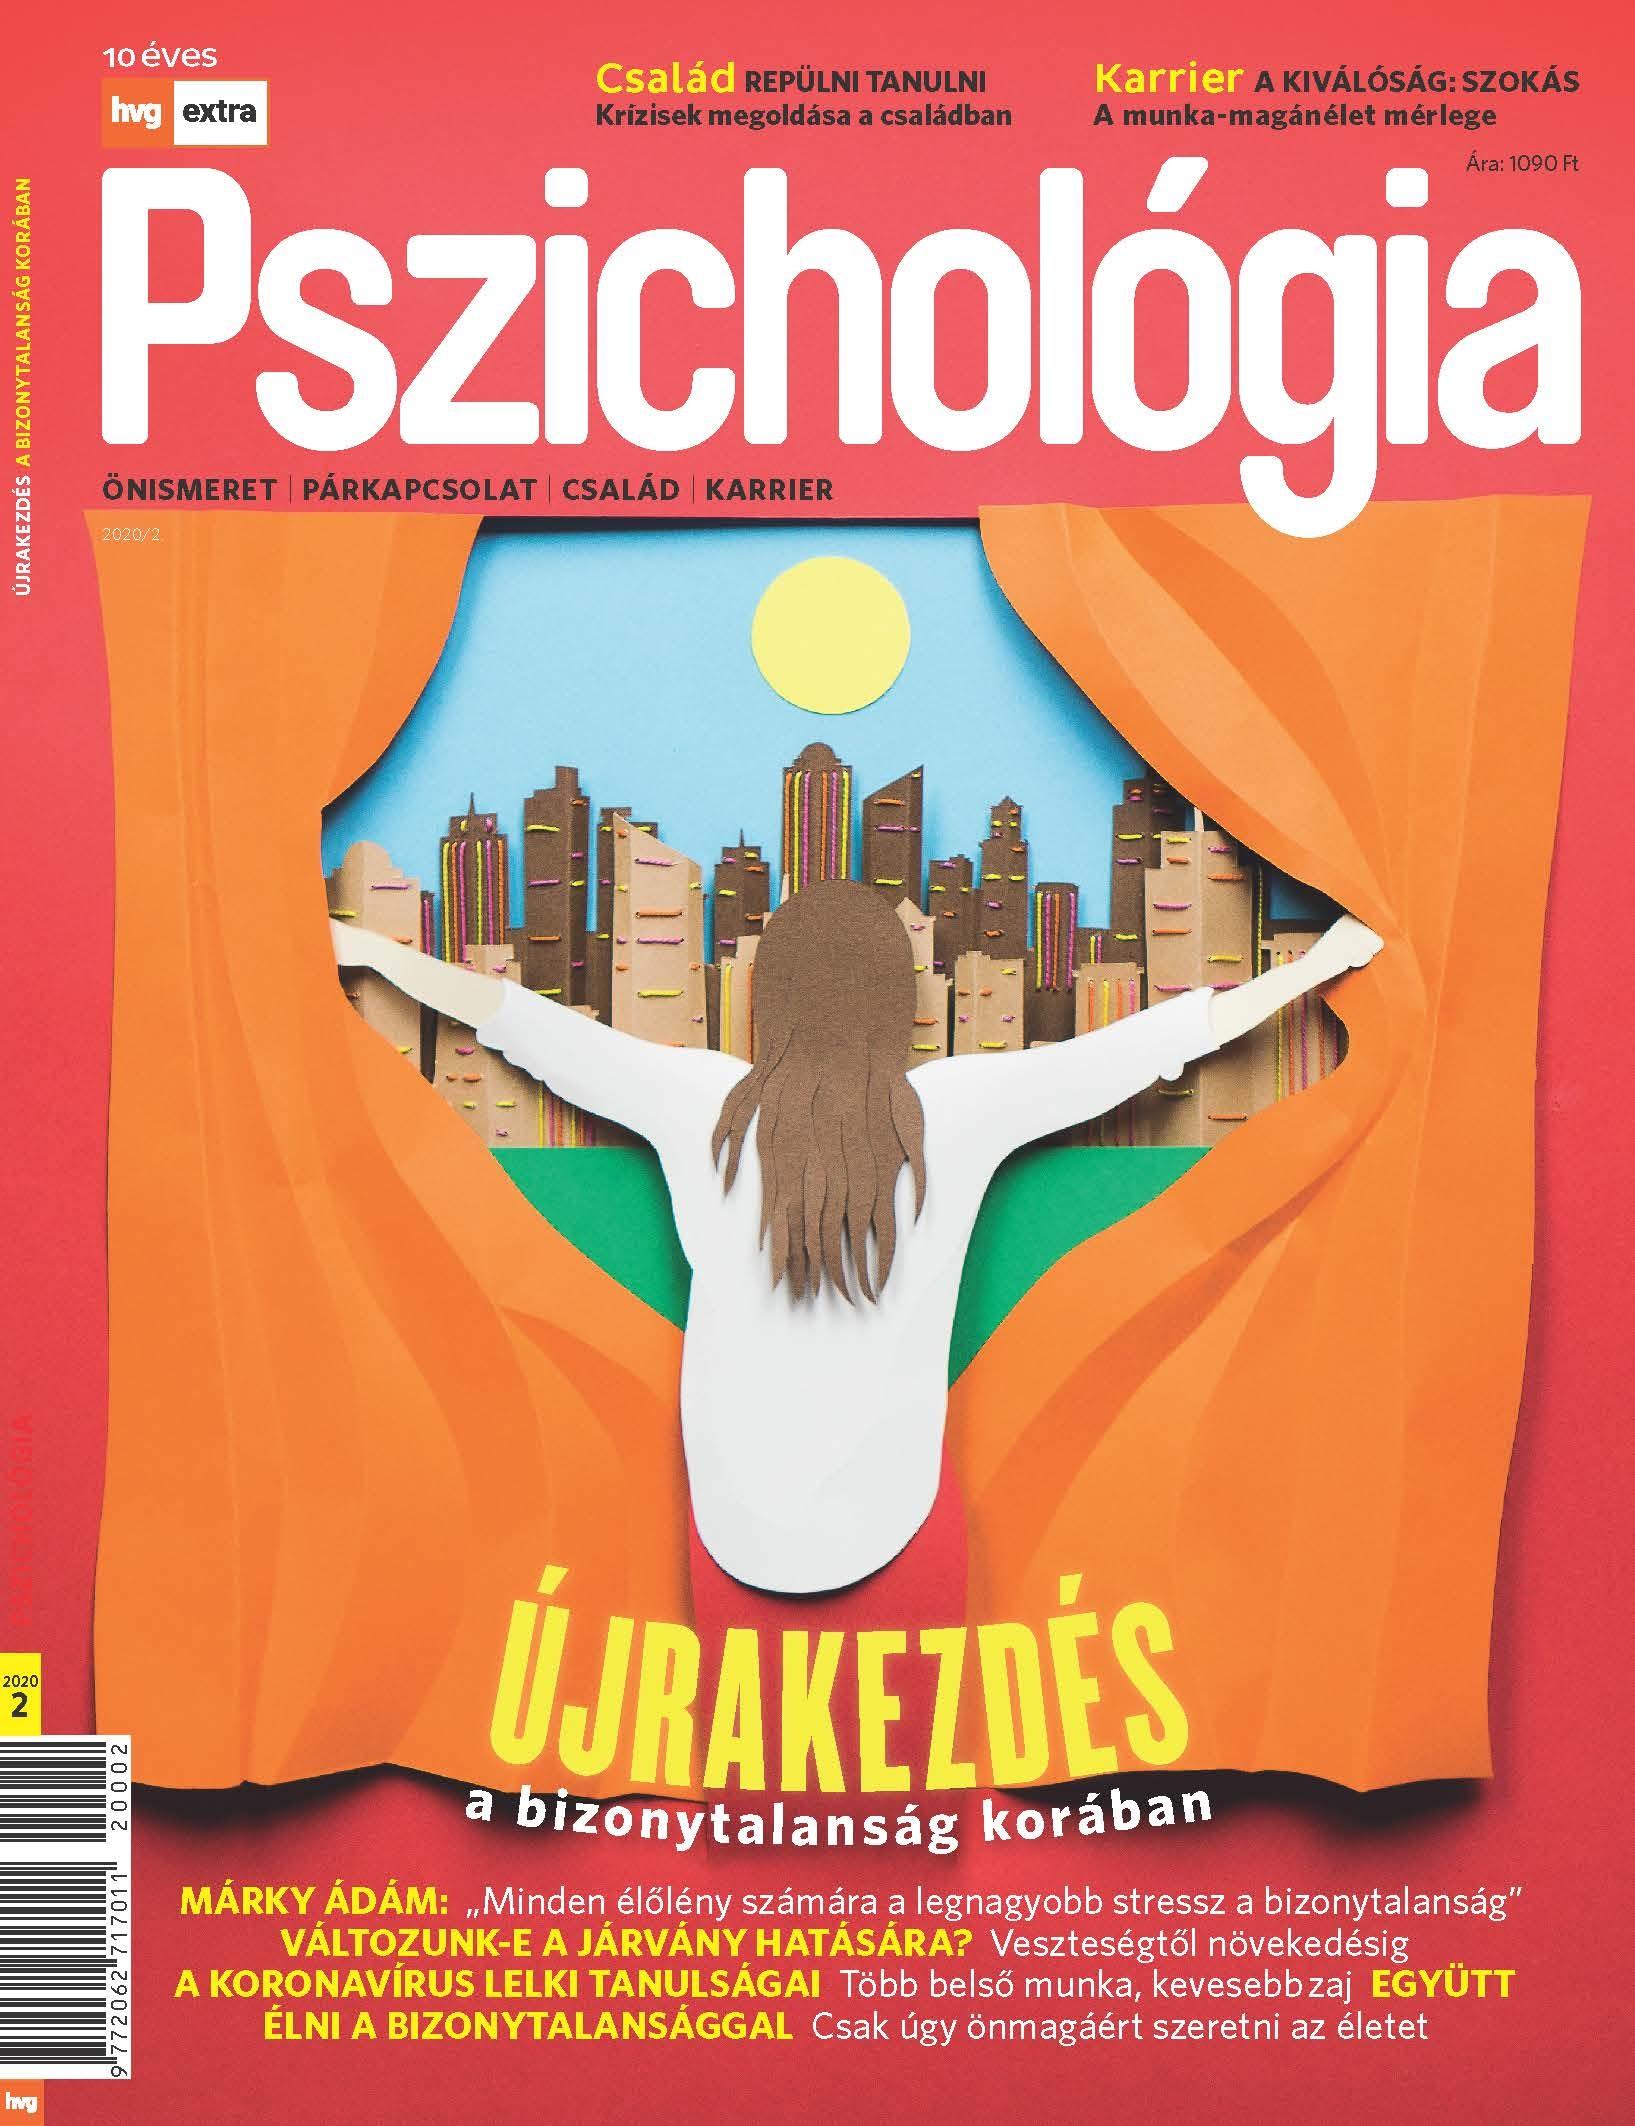 HVG Extra Magazin - Pszichológia 2020/002